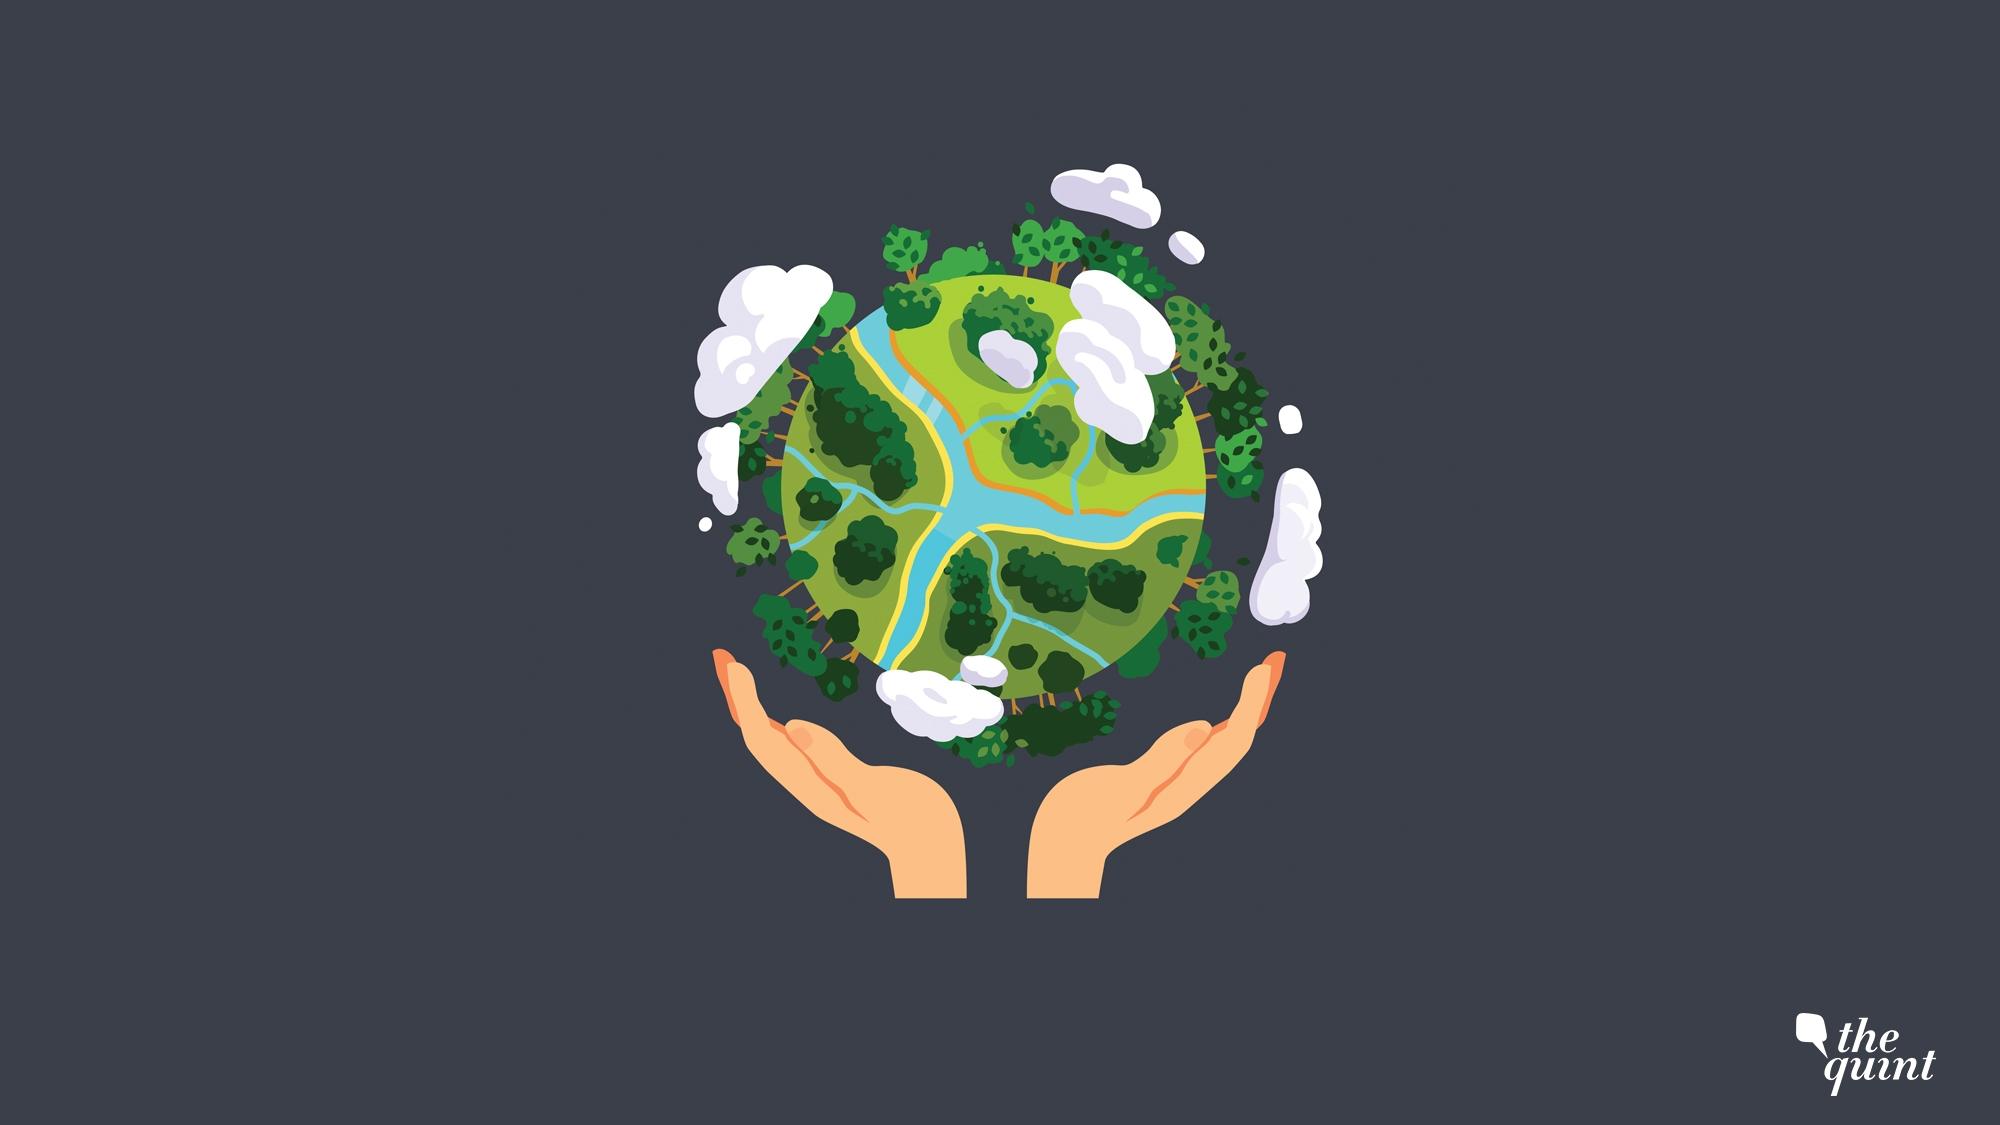 Not Just Activism, India Needs a 'Green Renaissance' Today